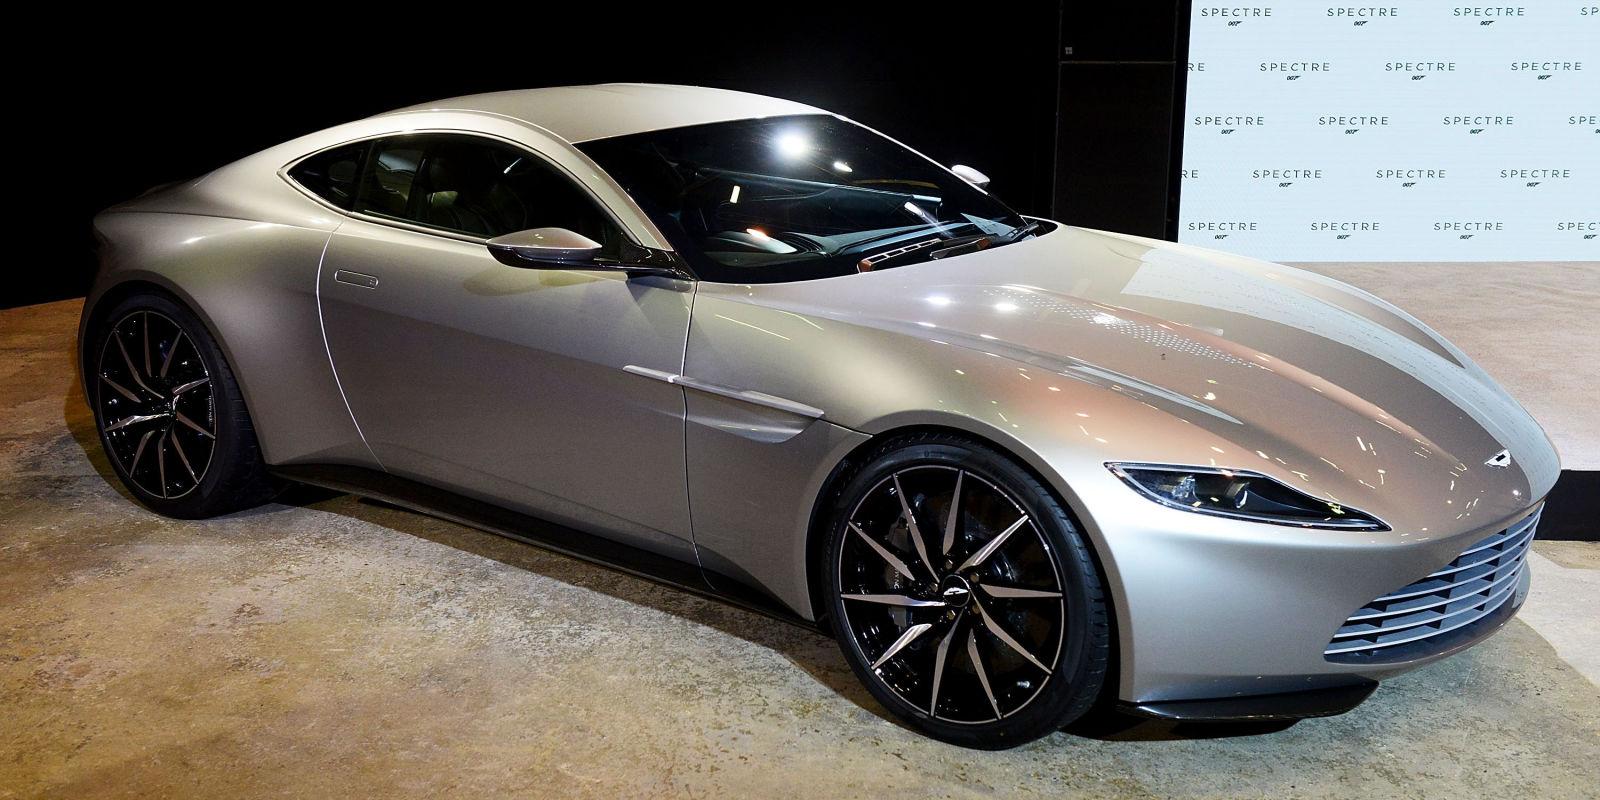 Creative Car James Bond Spectre 2015